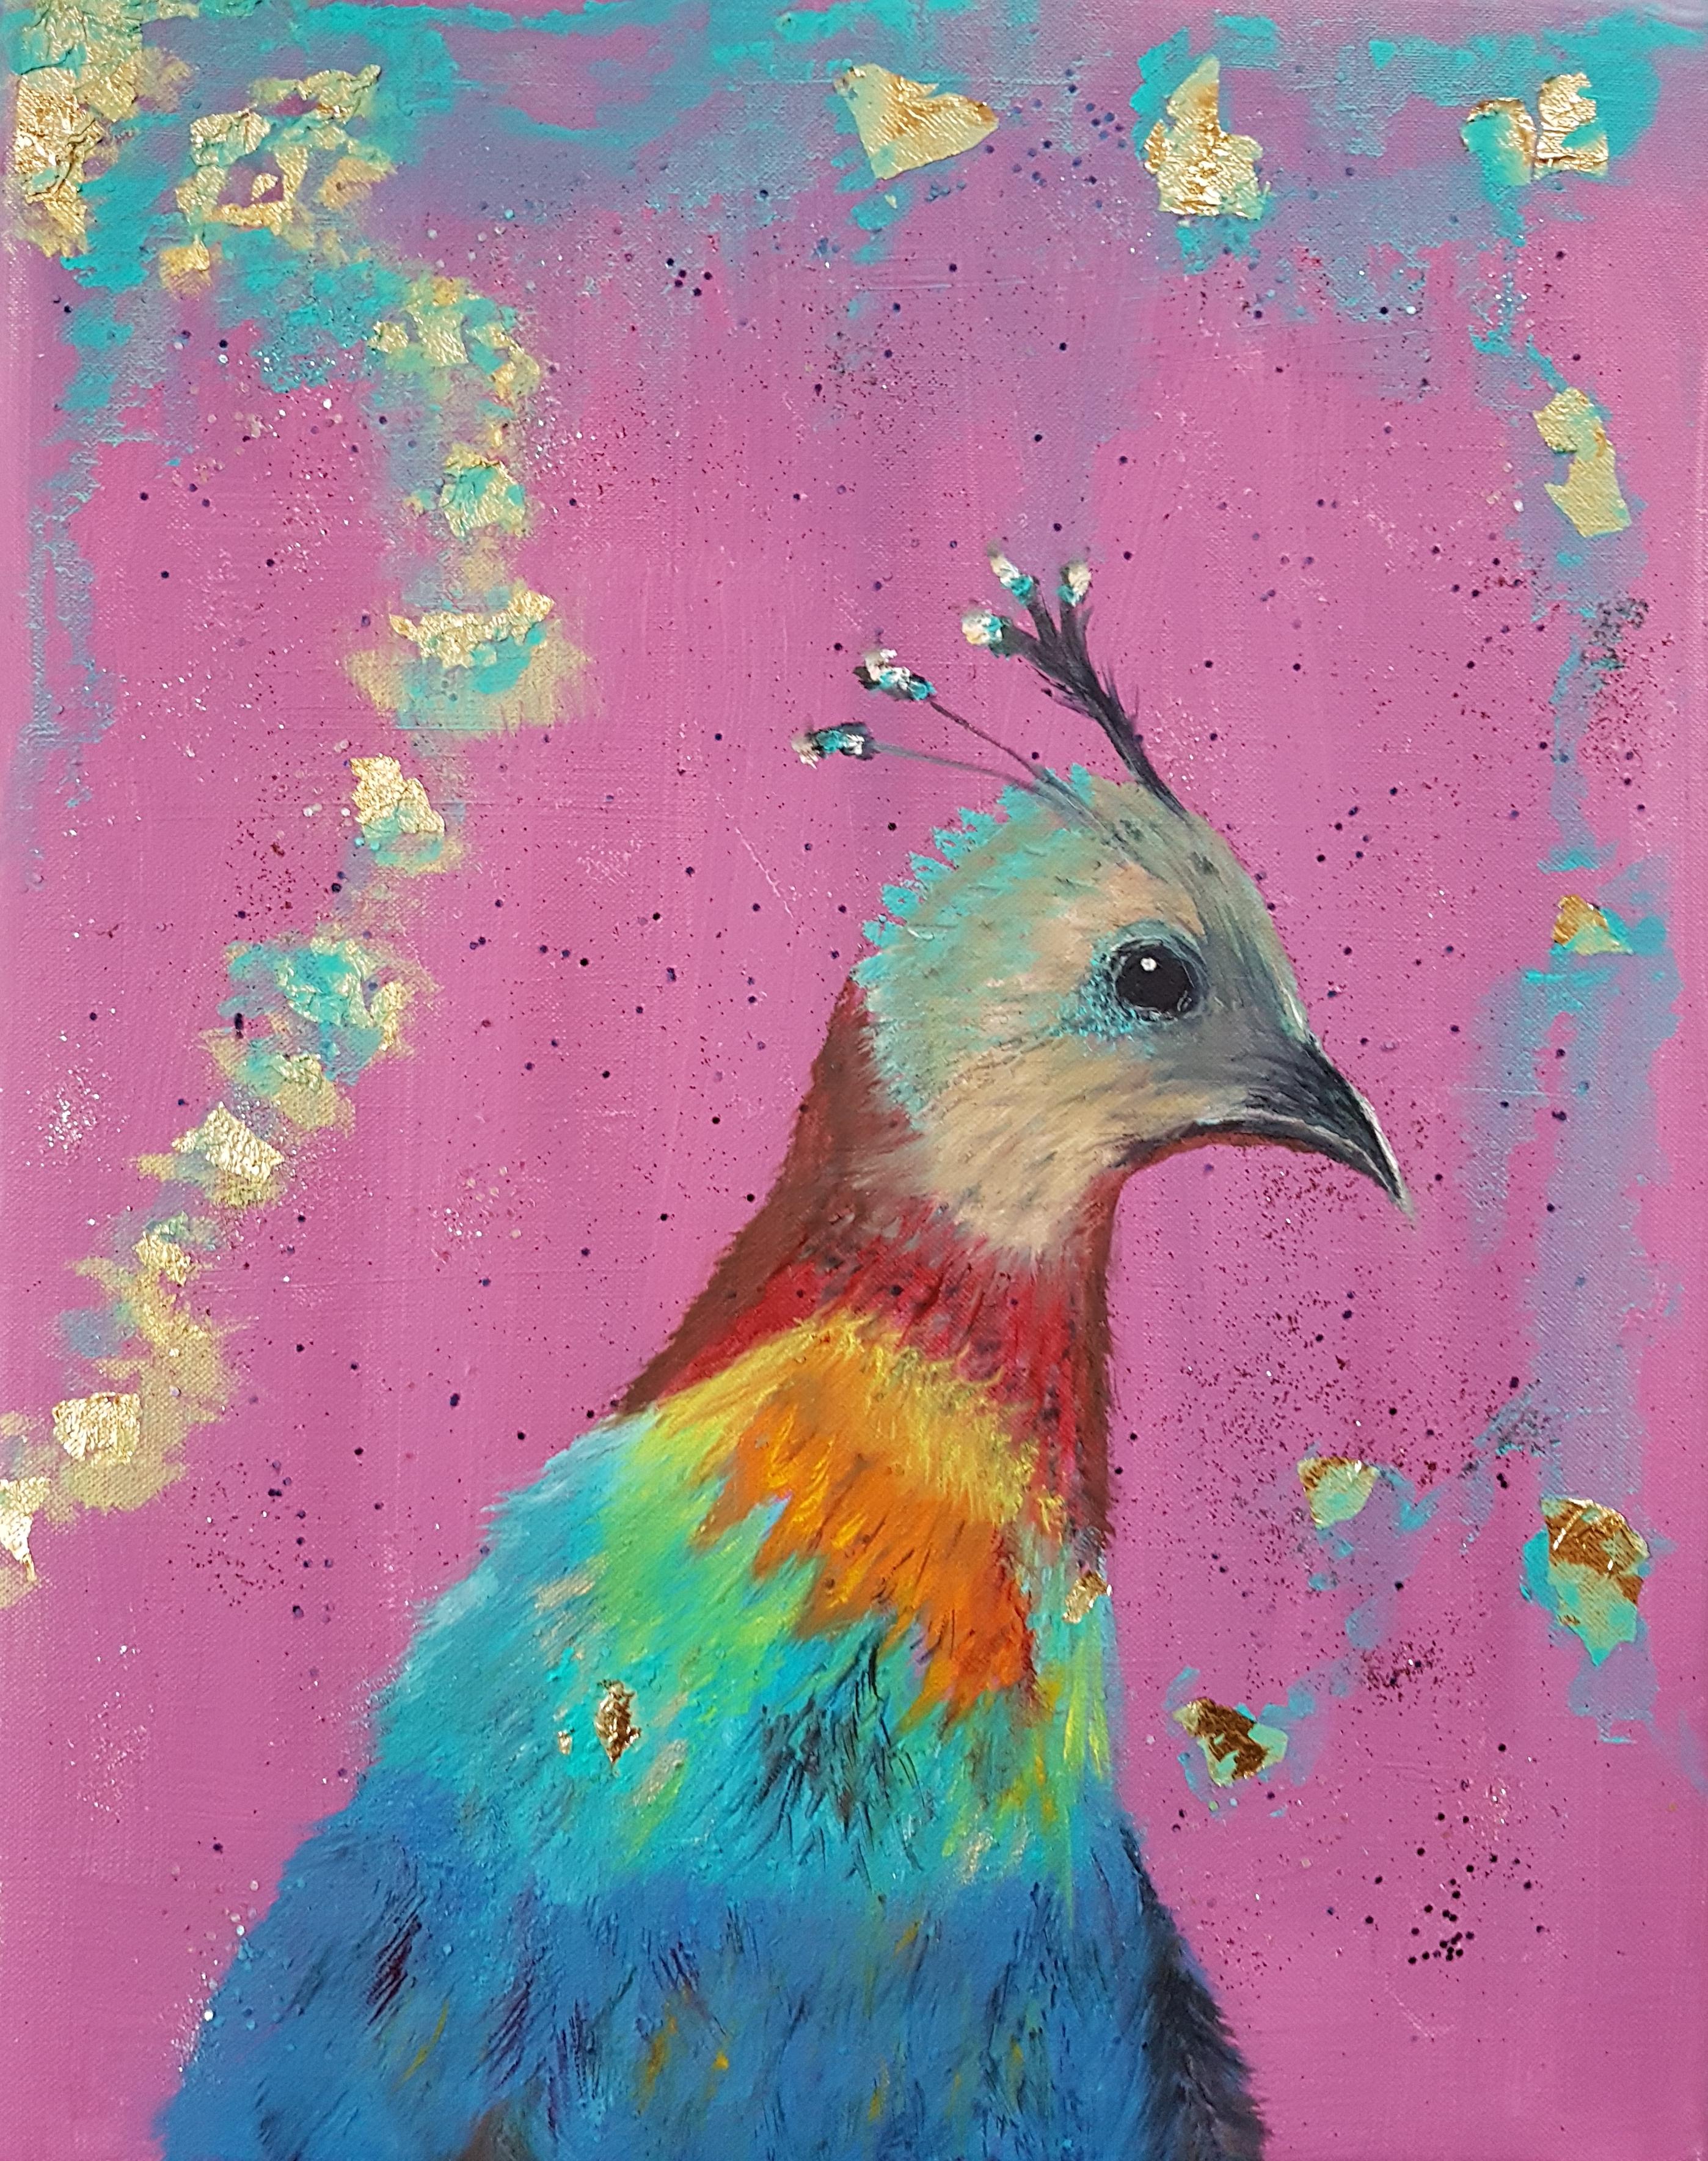 62. Mrs Peacock